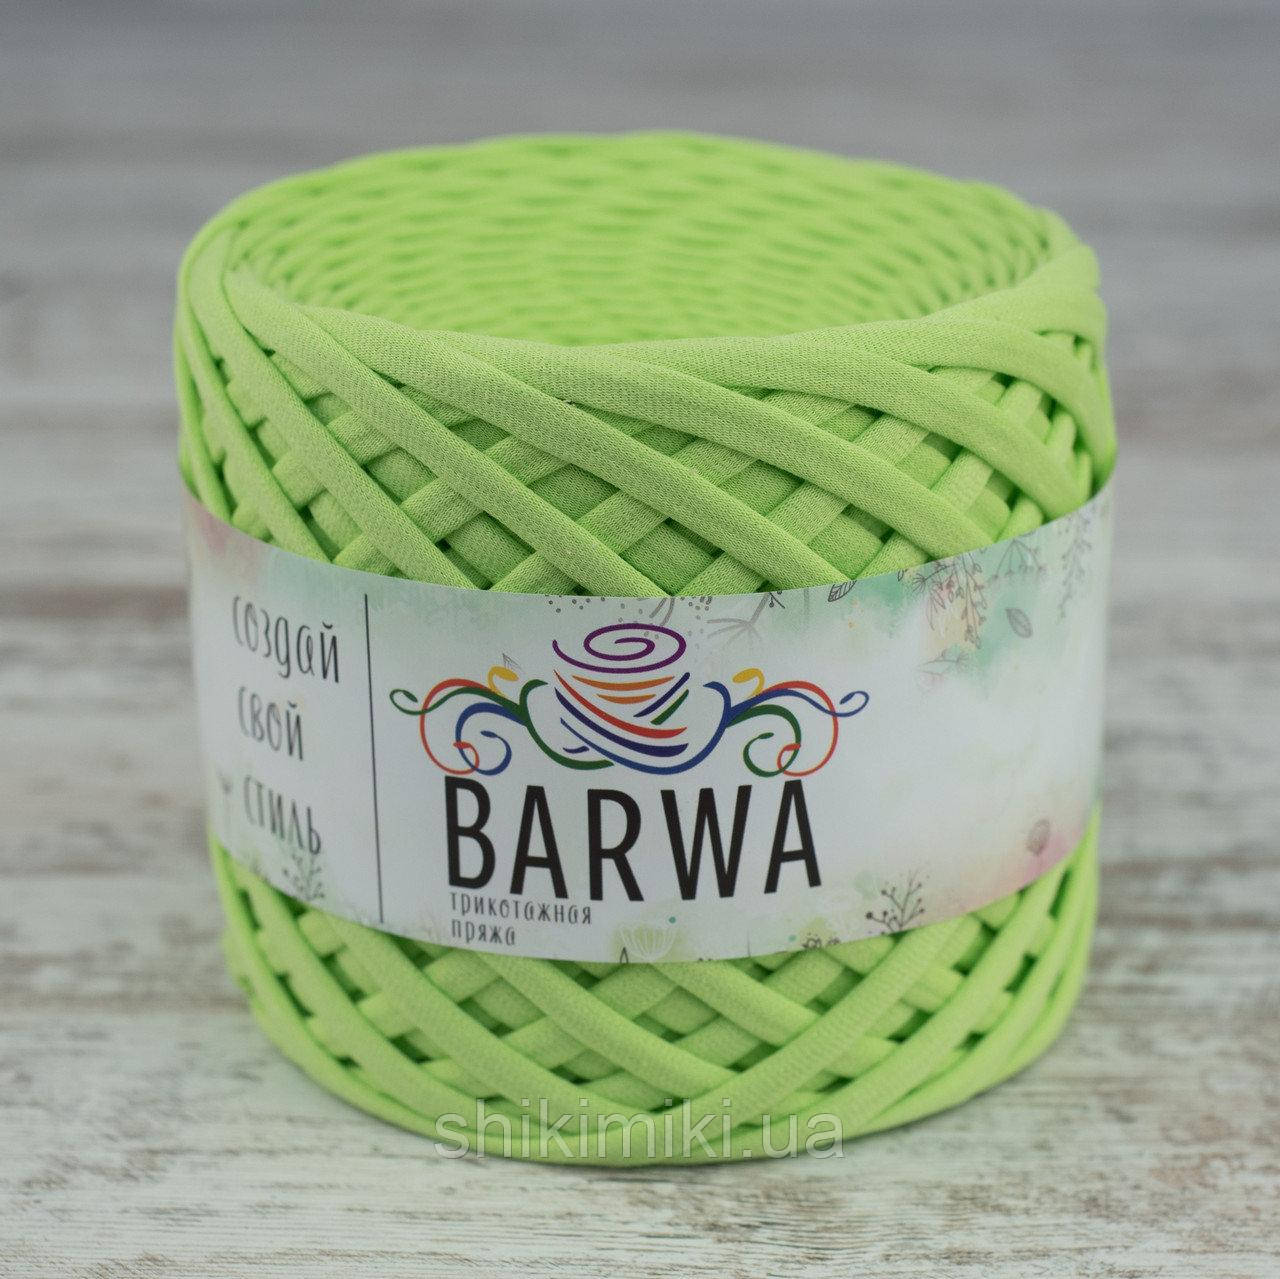 Трикотажная пряжа Barwa (7-9 мм), цвет Васаби